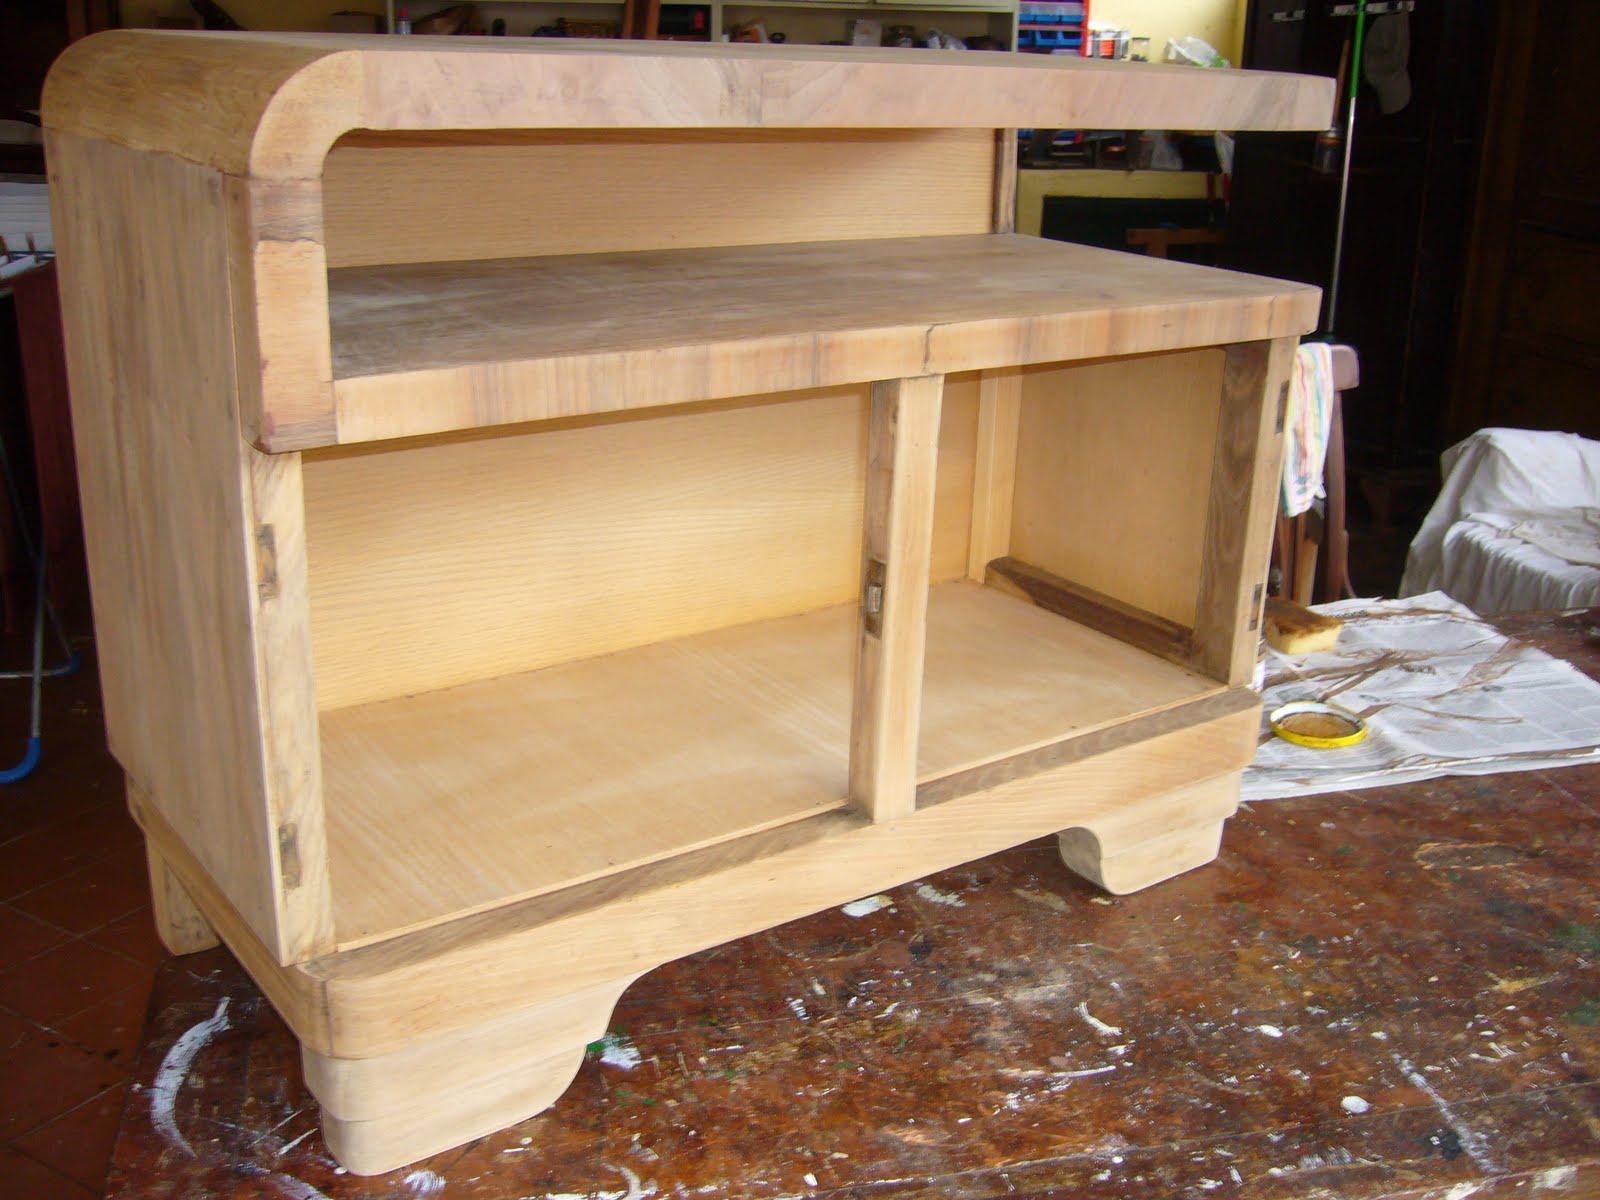 Muebles hogar tenerife 20170829122019 for Decoracion hogar tenerife